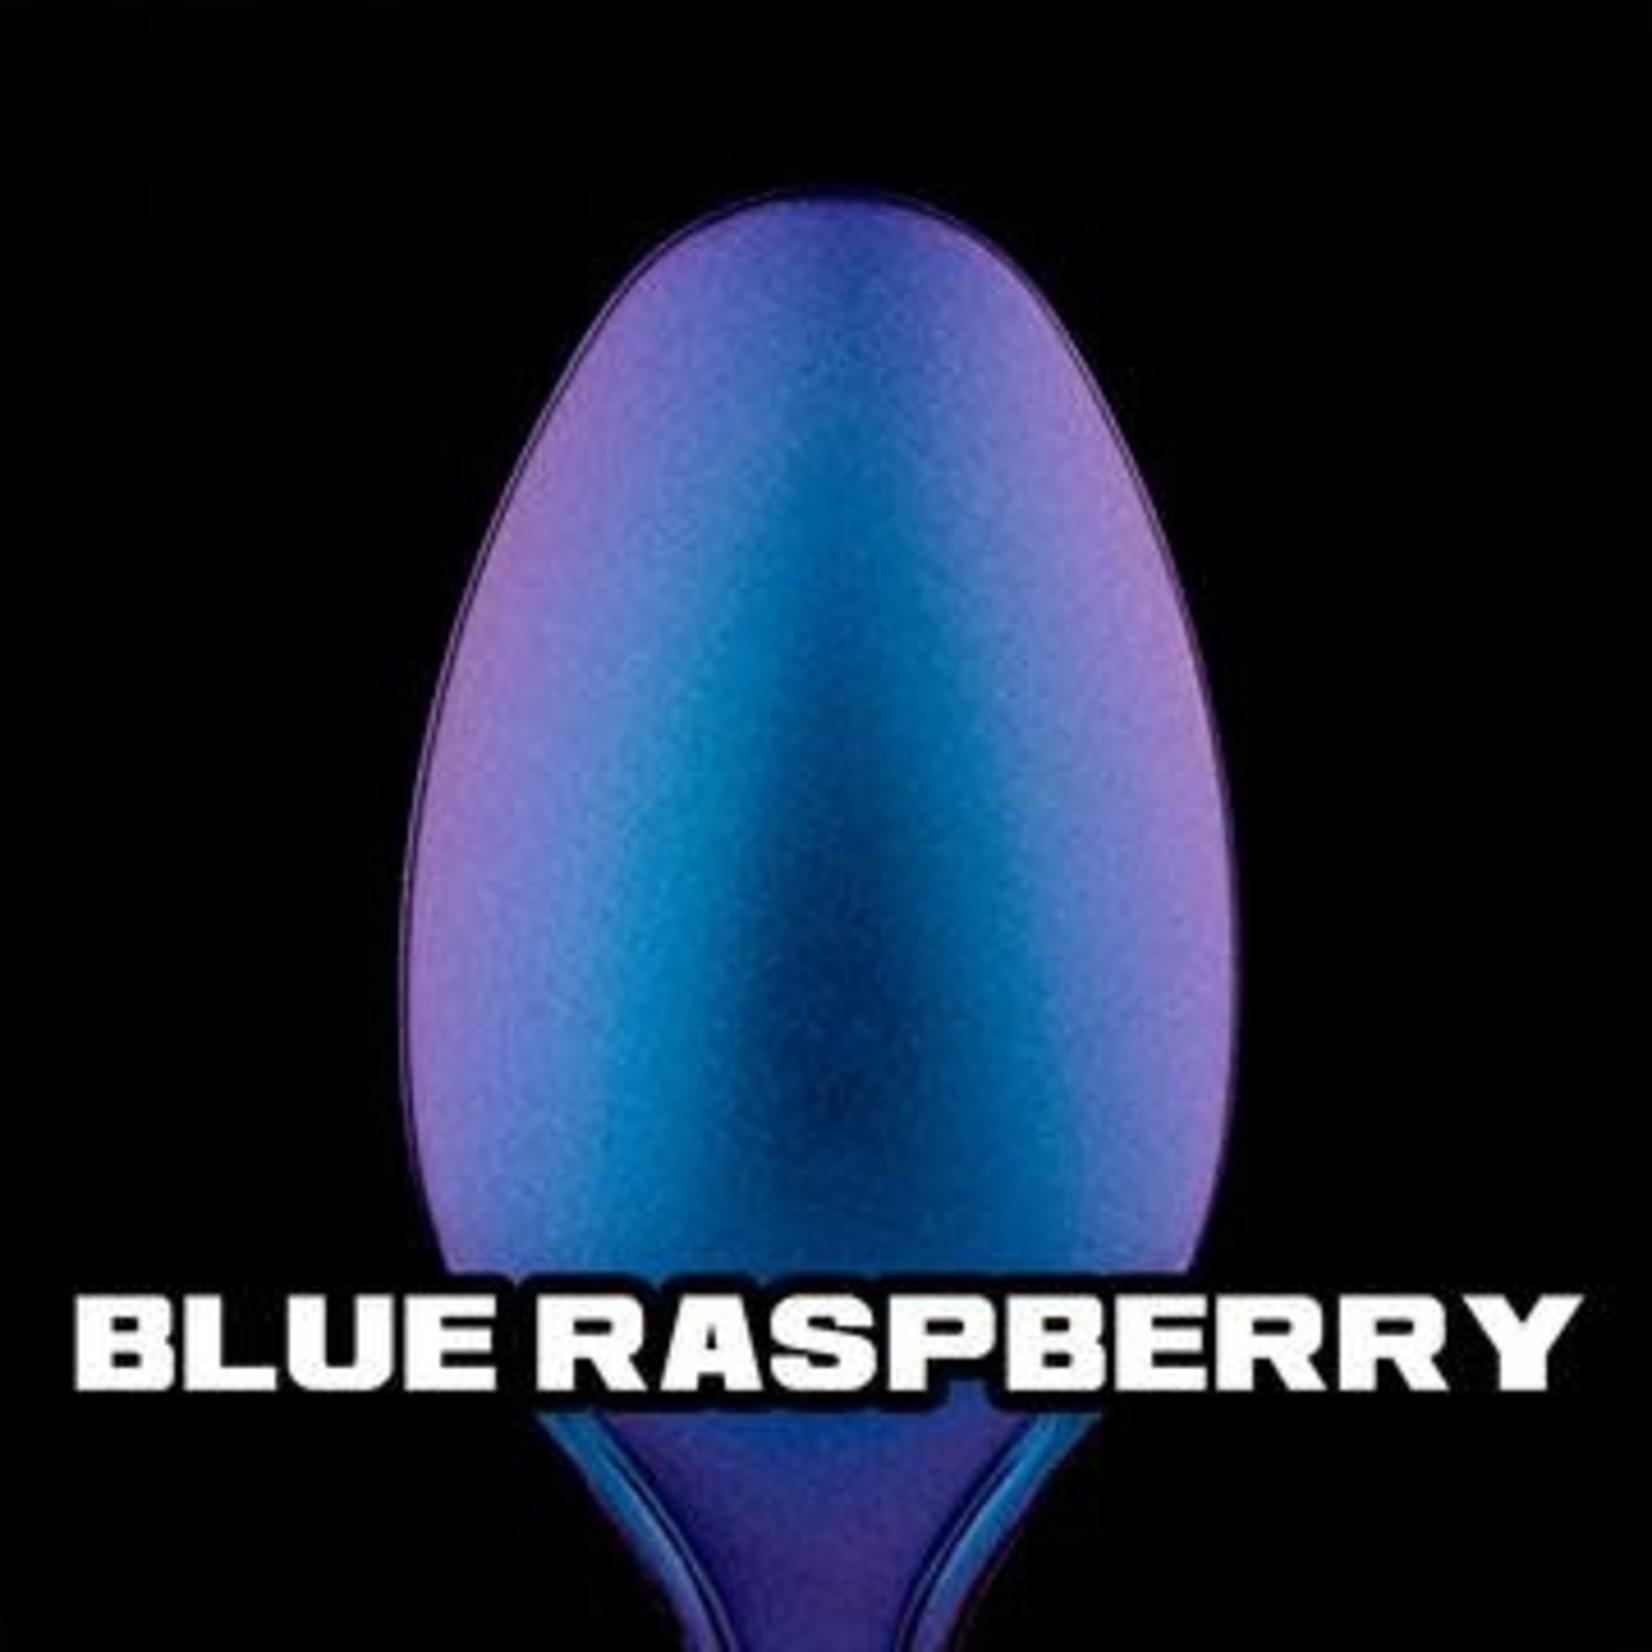 Turbo Dork Turbo Dork Blue Raspberry Colorshift Acrylic Paint 20ml Bottle